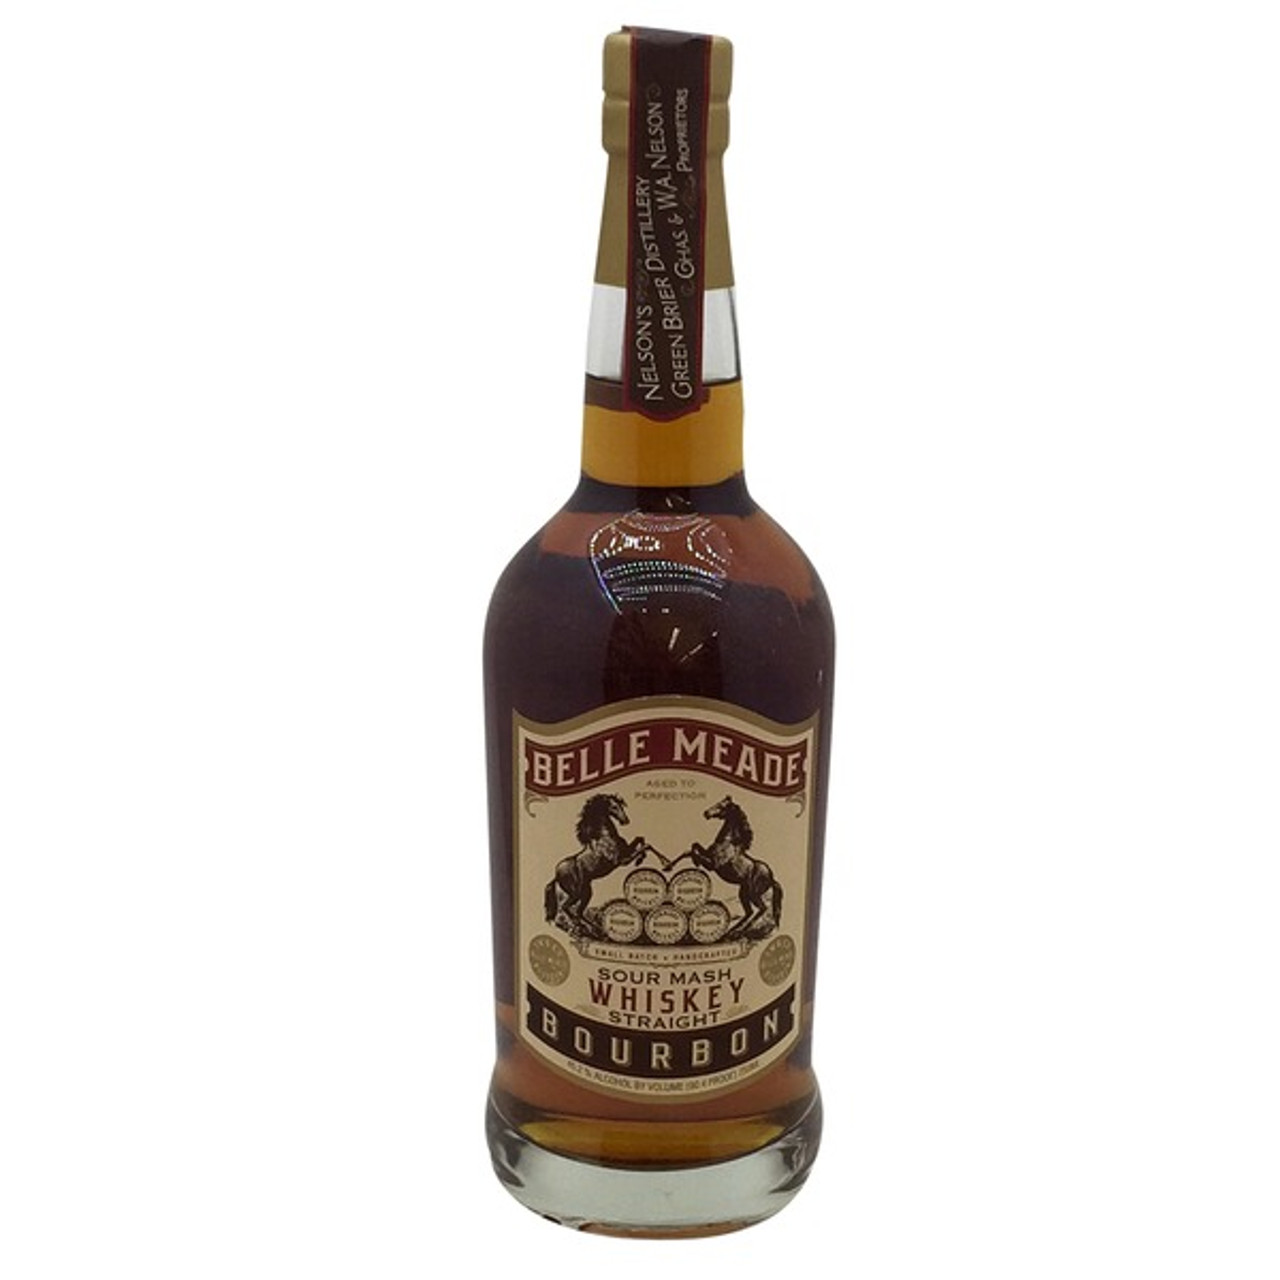 Belle Meade Bourbon 750ml